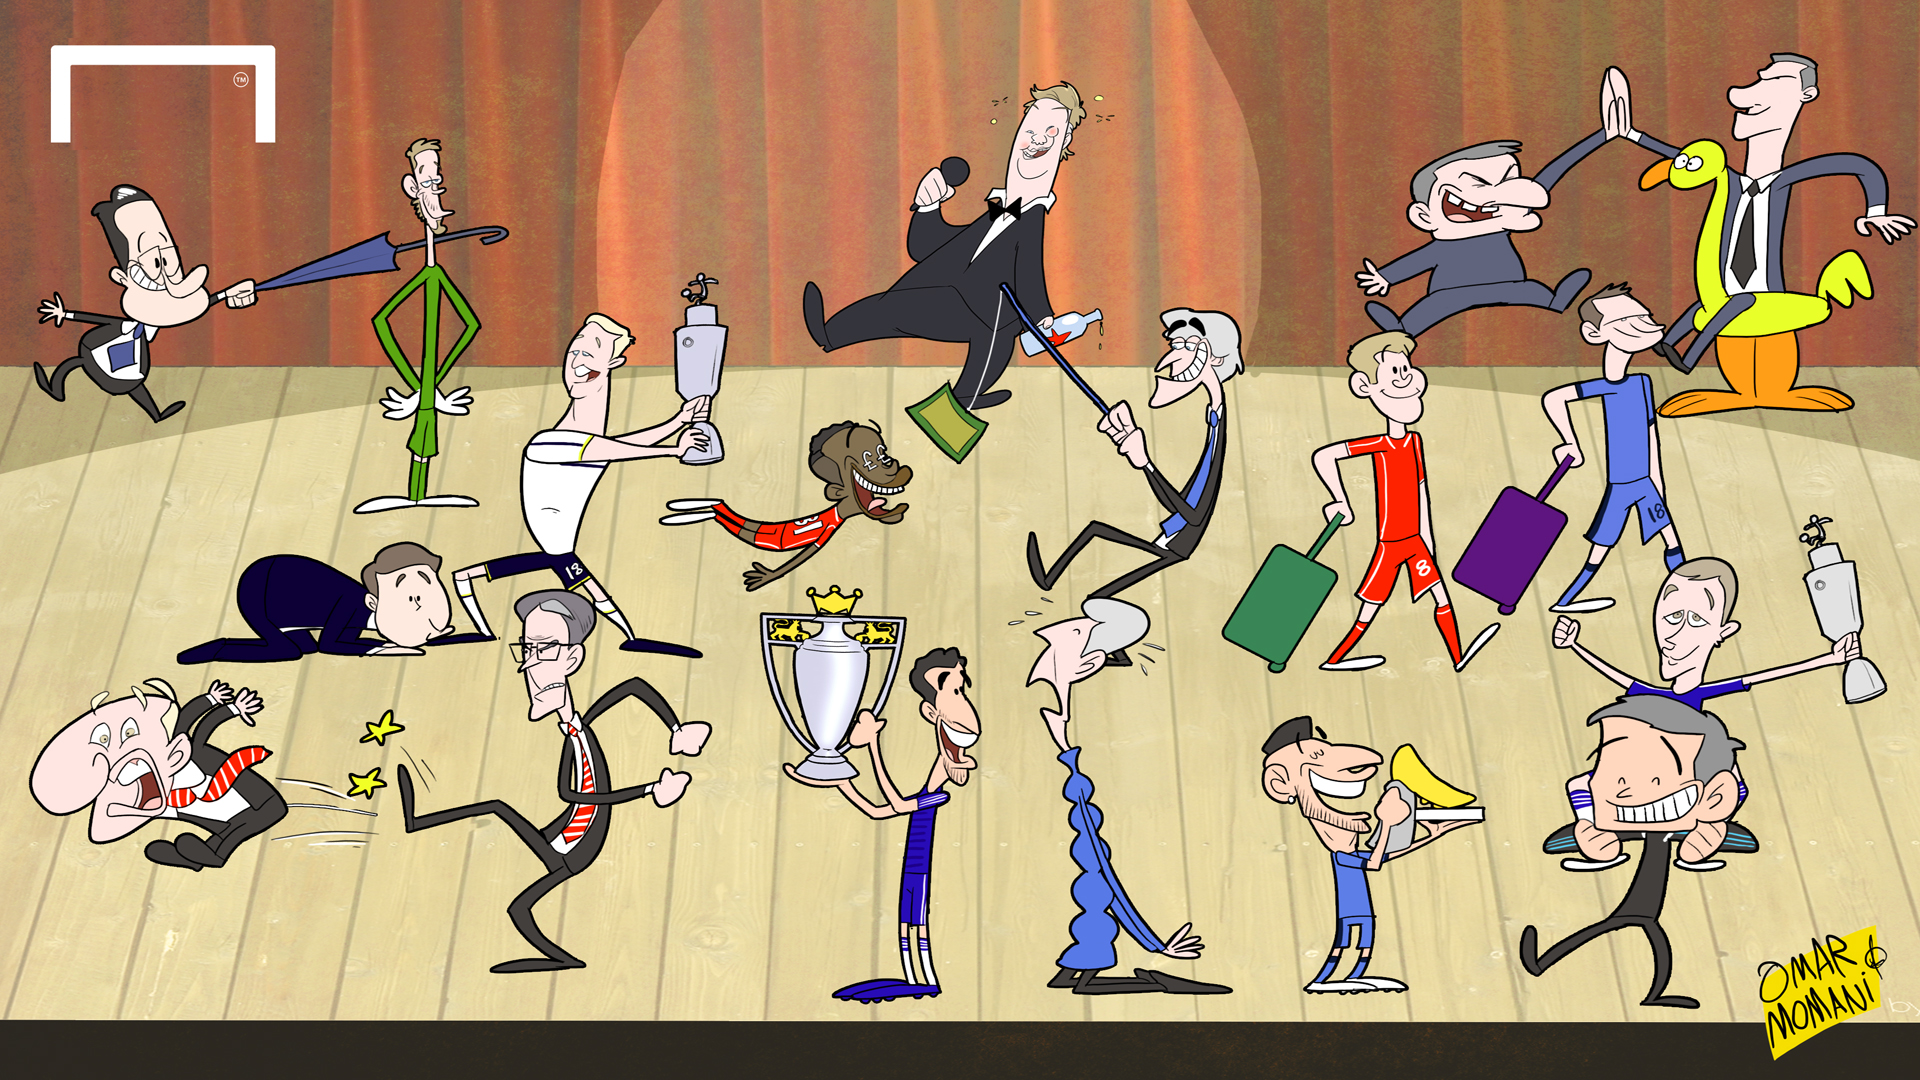 премьер-лига Англия, Арсенал, Эден Азар, Манчестер Сити, Тоттенхэм, Фрэнк Лэмпард, Ливерпуль, Манчестер Юнайтед, Челси, Стивен Джеррард